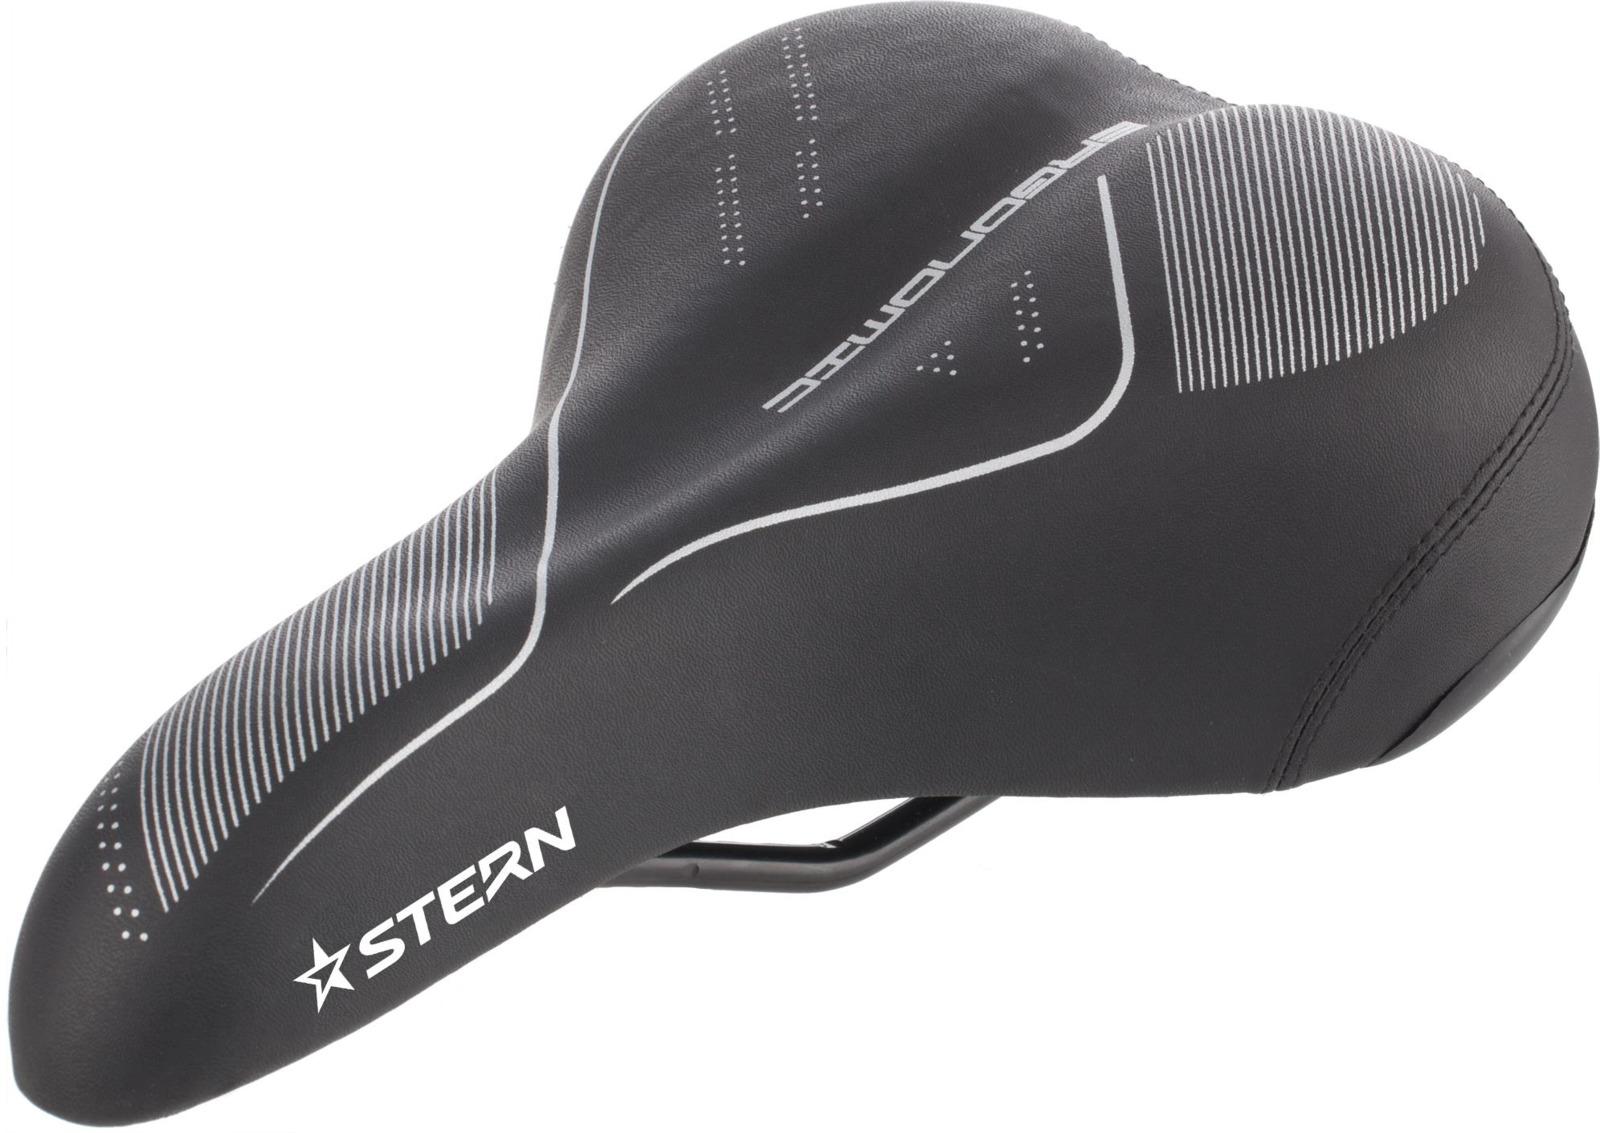 Седло для велосипеда Stern CS-2, черный, 245 х 215 мм запчасти для велосипеда stern